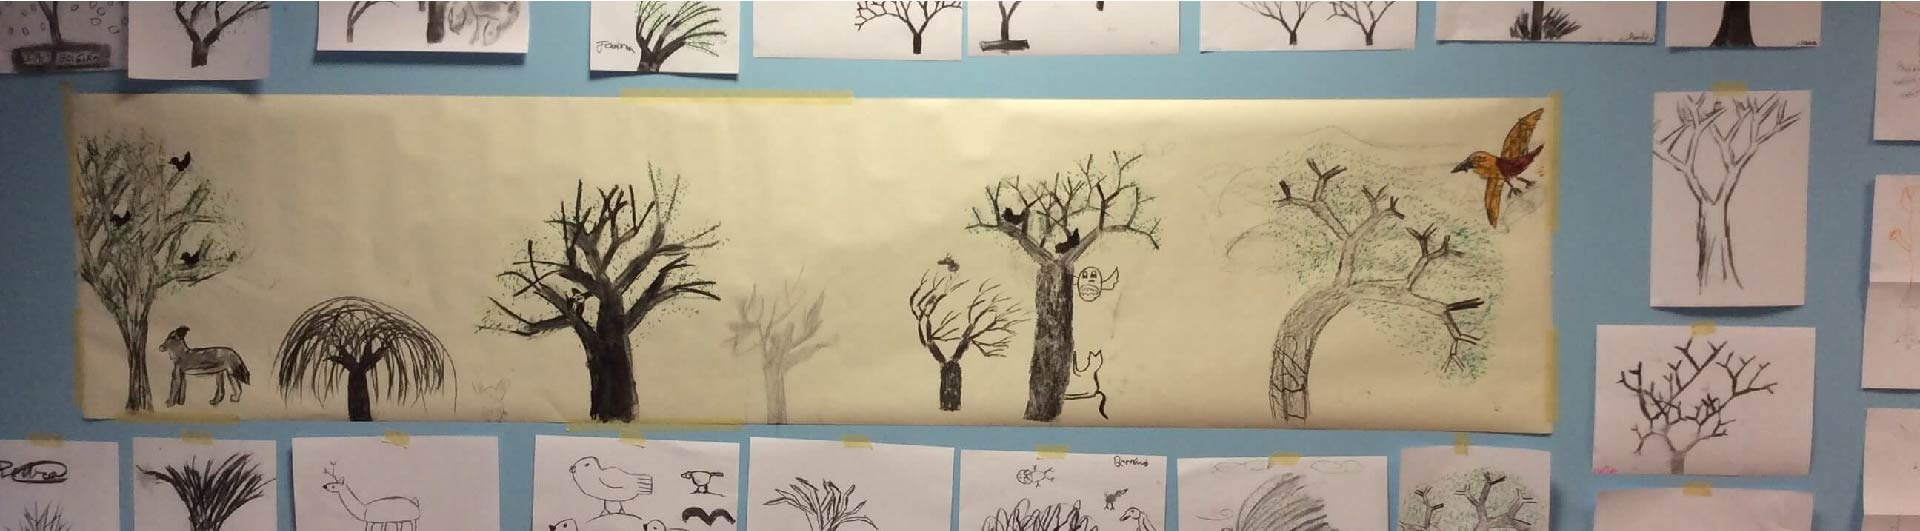 cerdeira-workshop-desenho-familias-capa.jpg